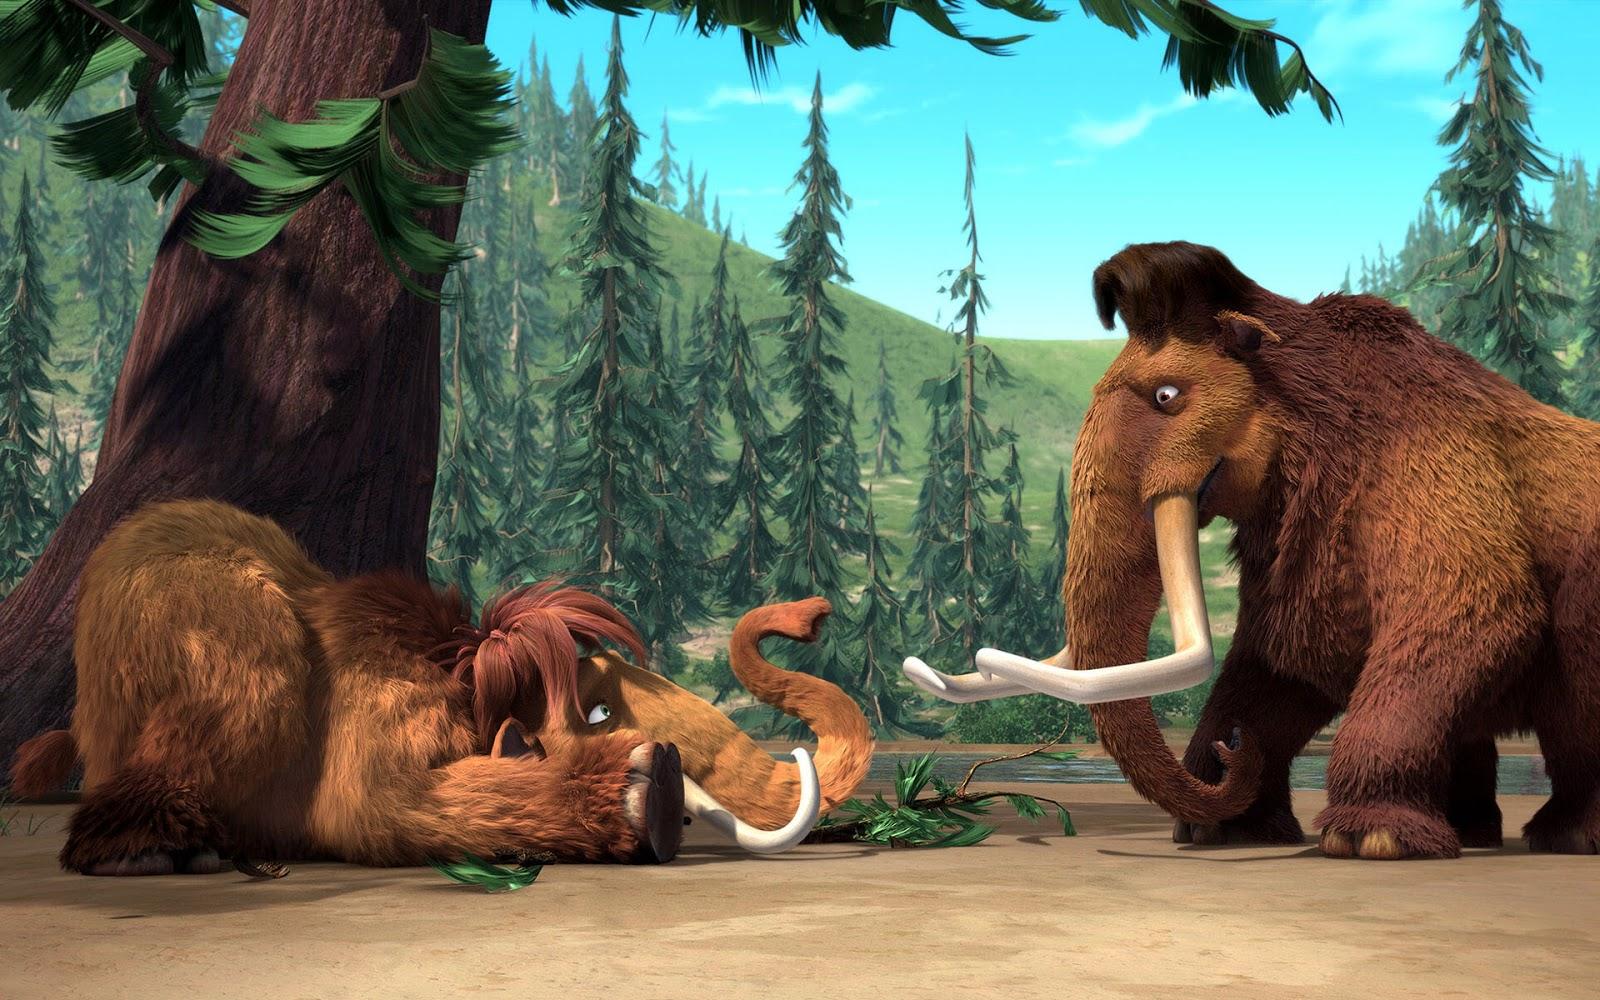 Ice Age 4 Widescreen 3D Wallpaper